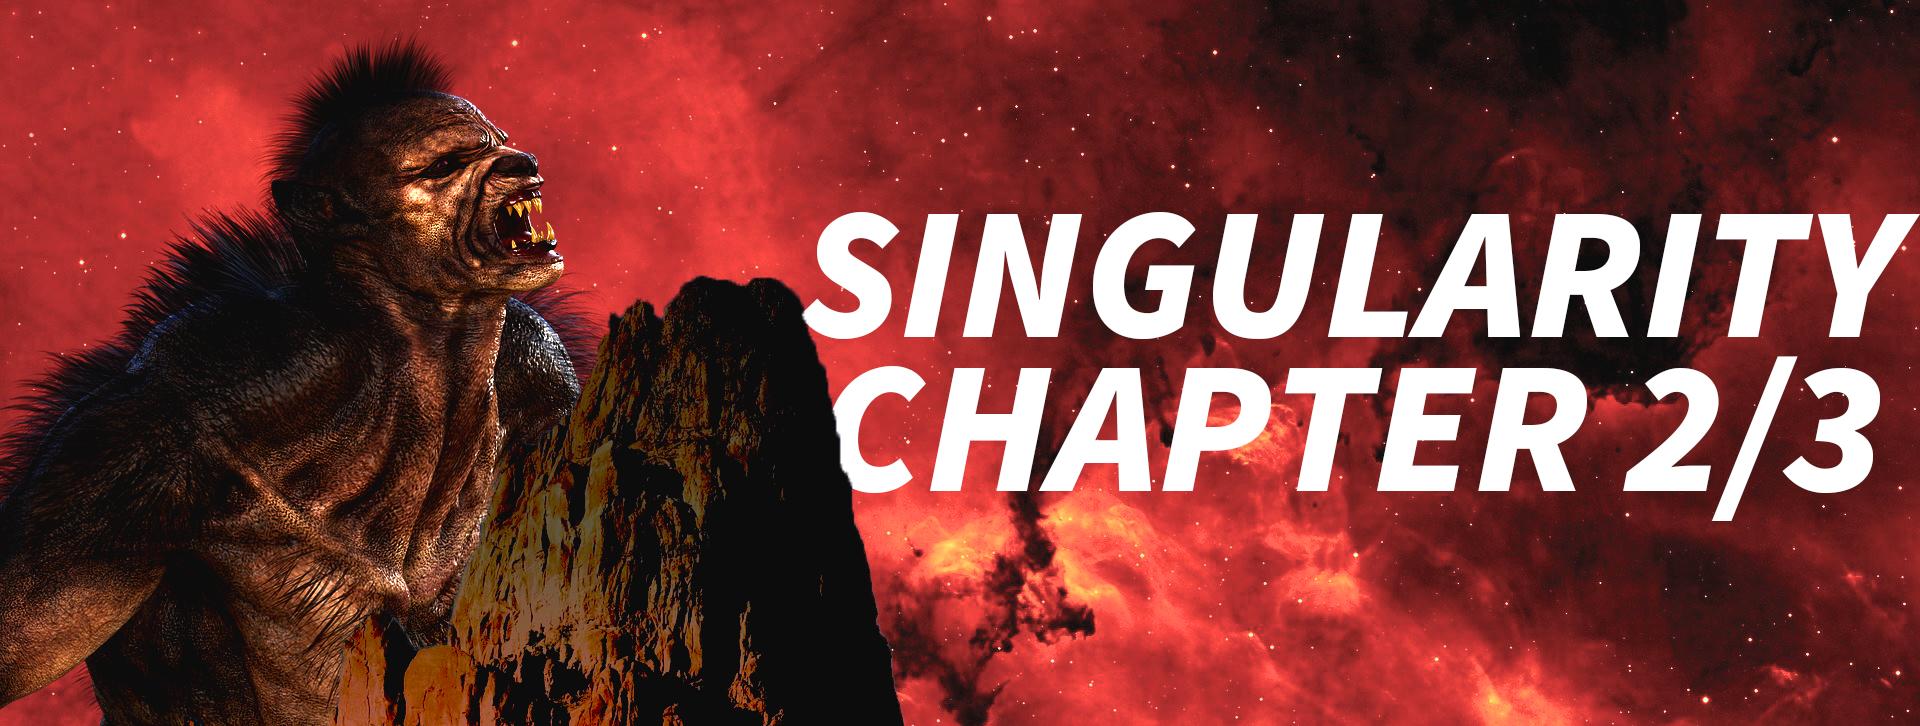 Singularity Chapter 2